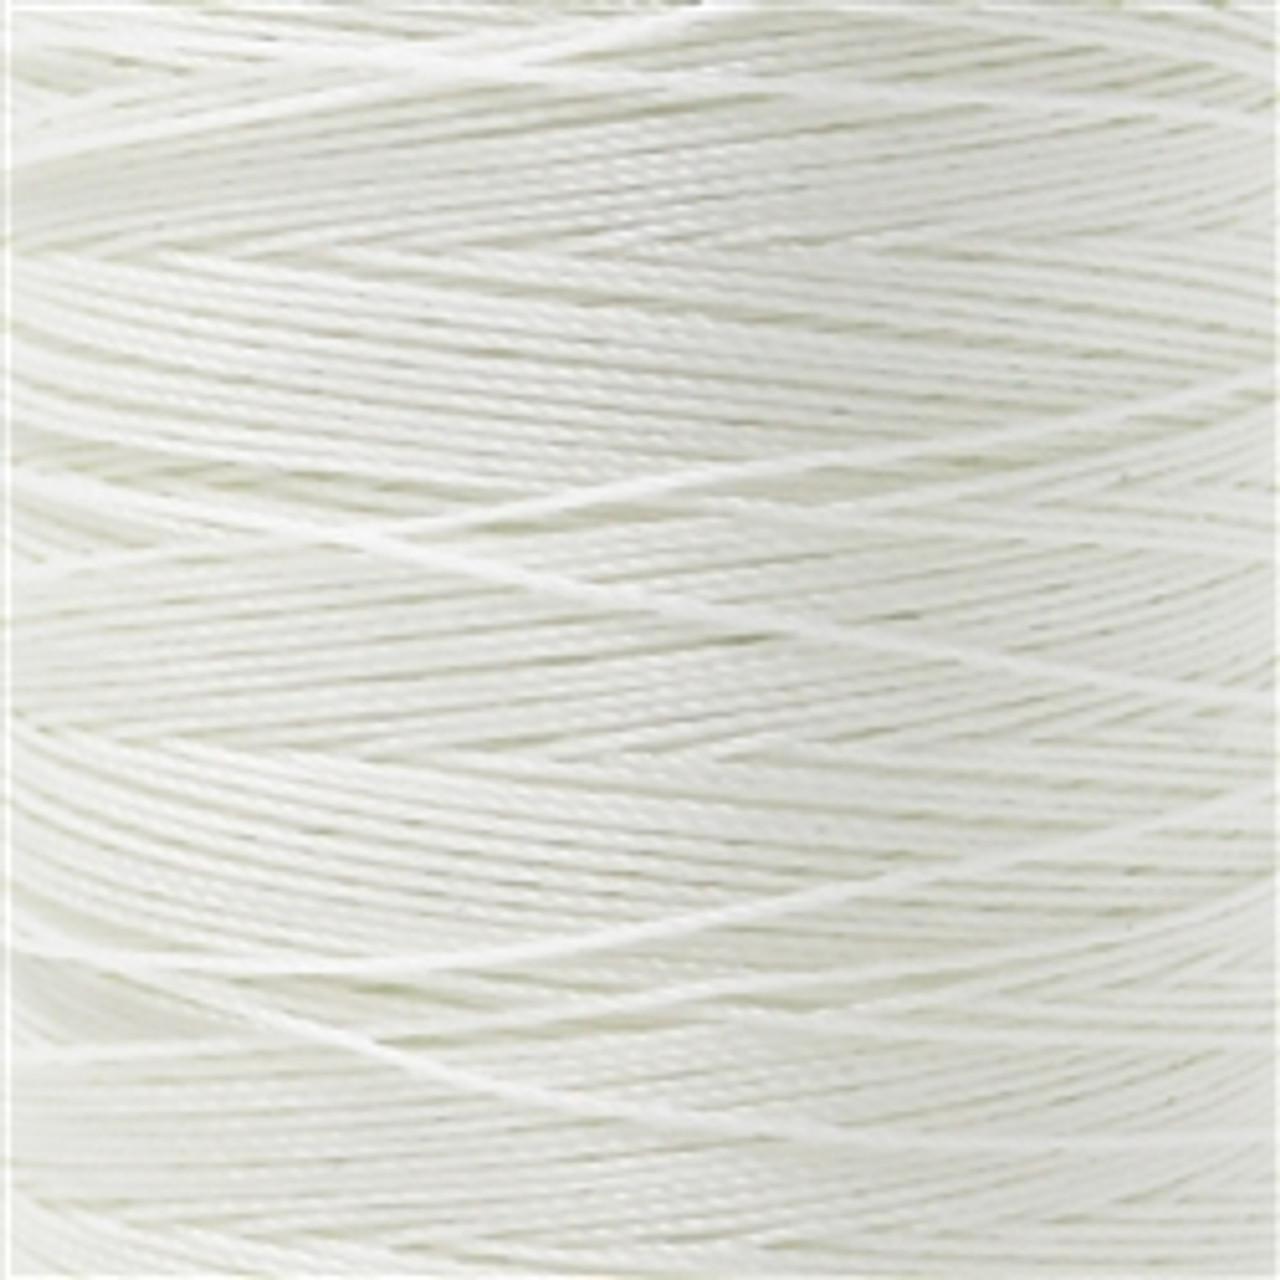 QTC T-270 Bonded Nylon Thread White 721Q 8 oz Spool